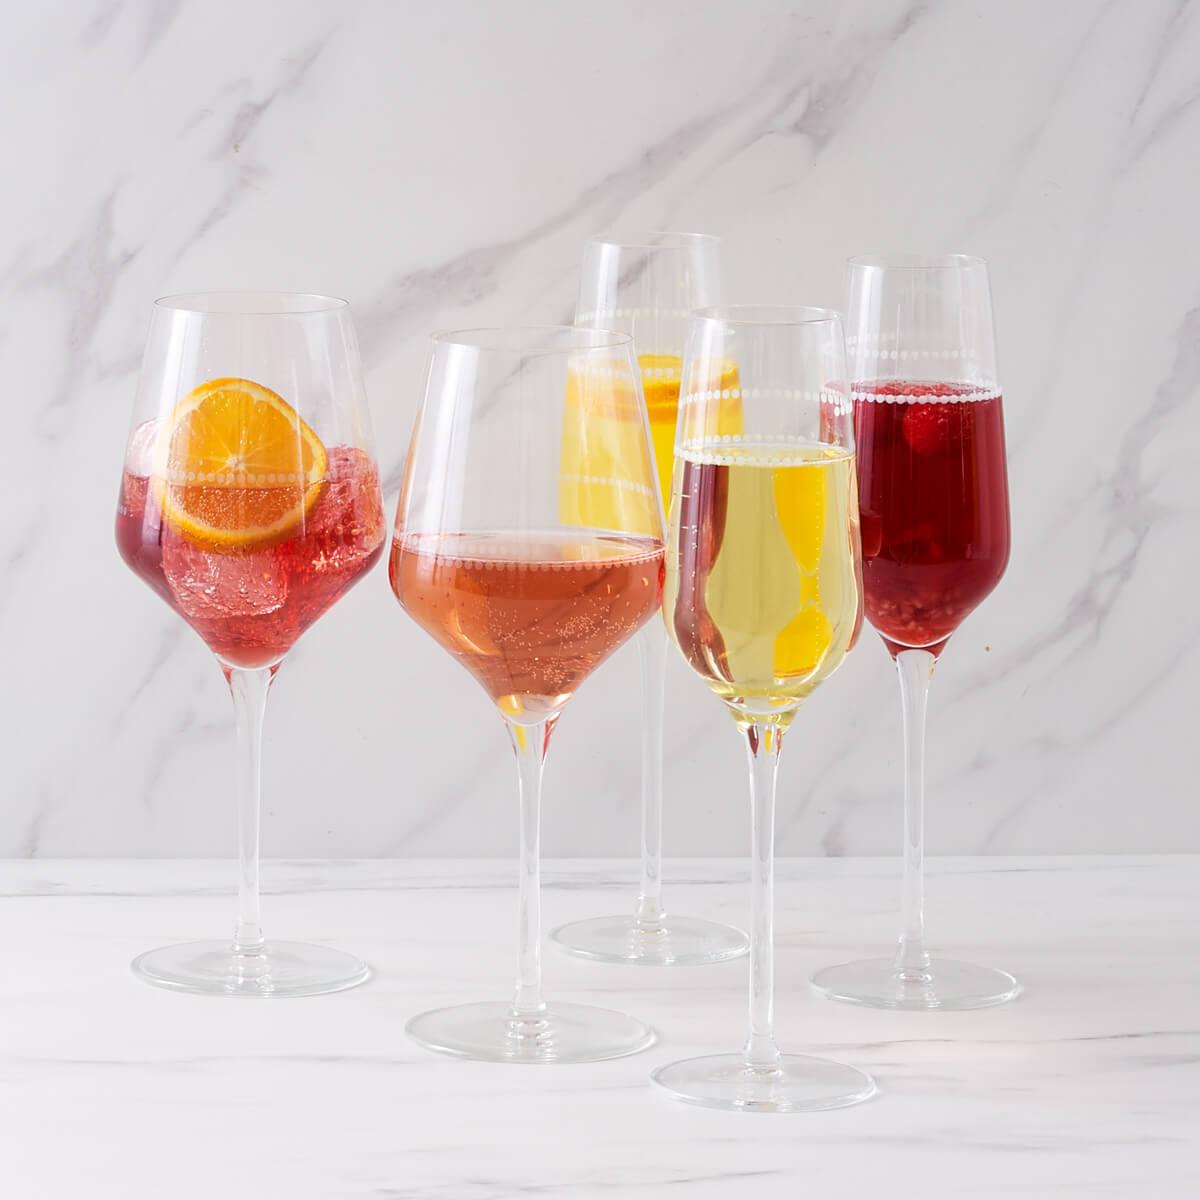 Wine Glasses - lifestyle